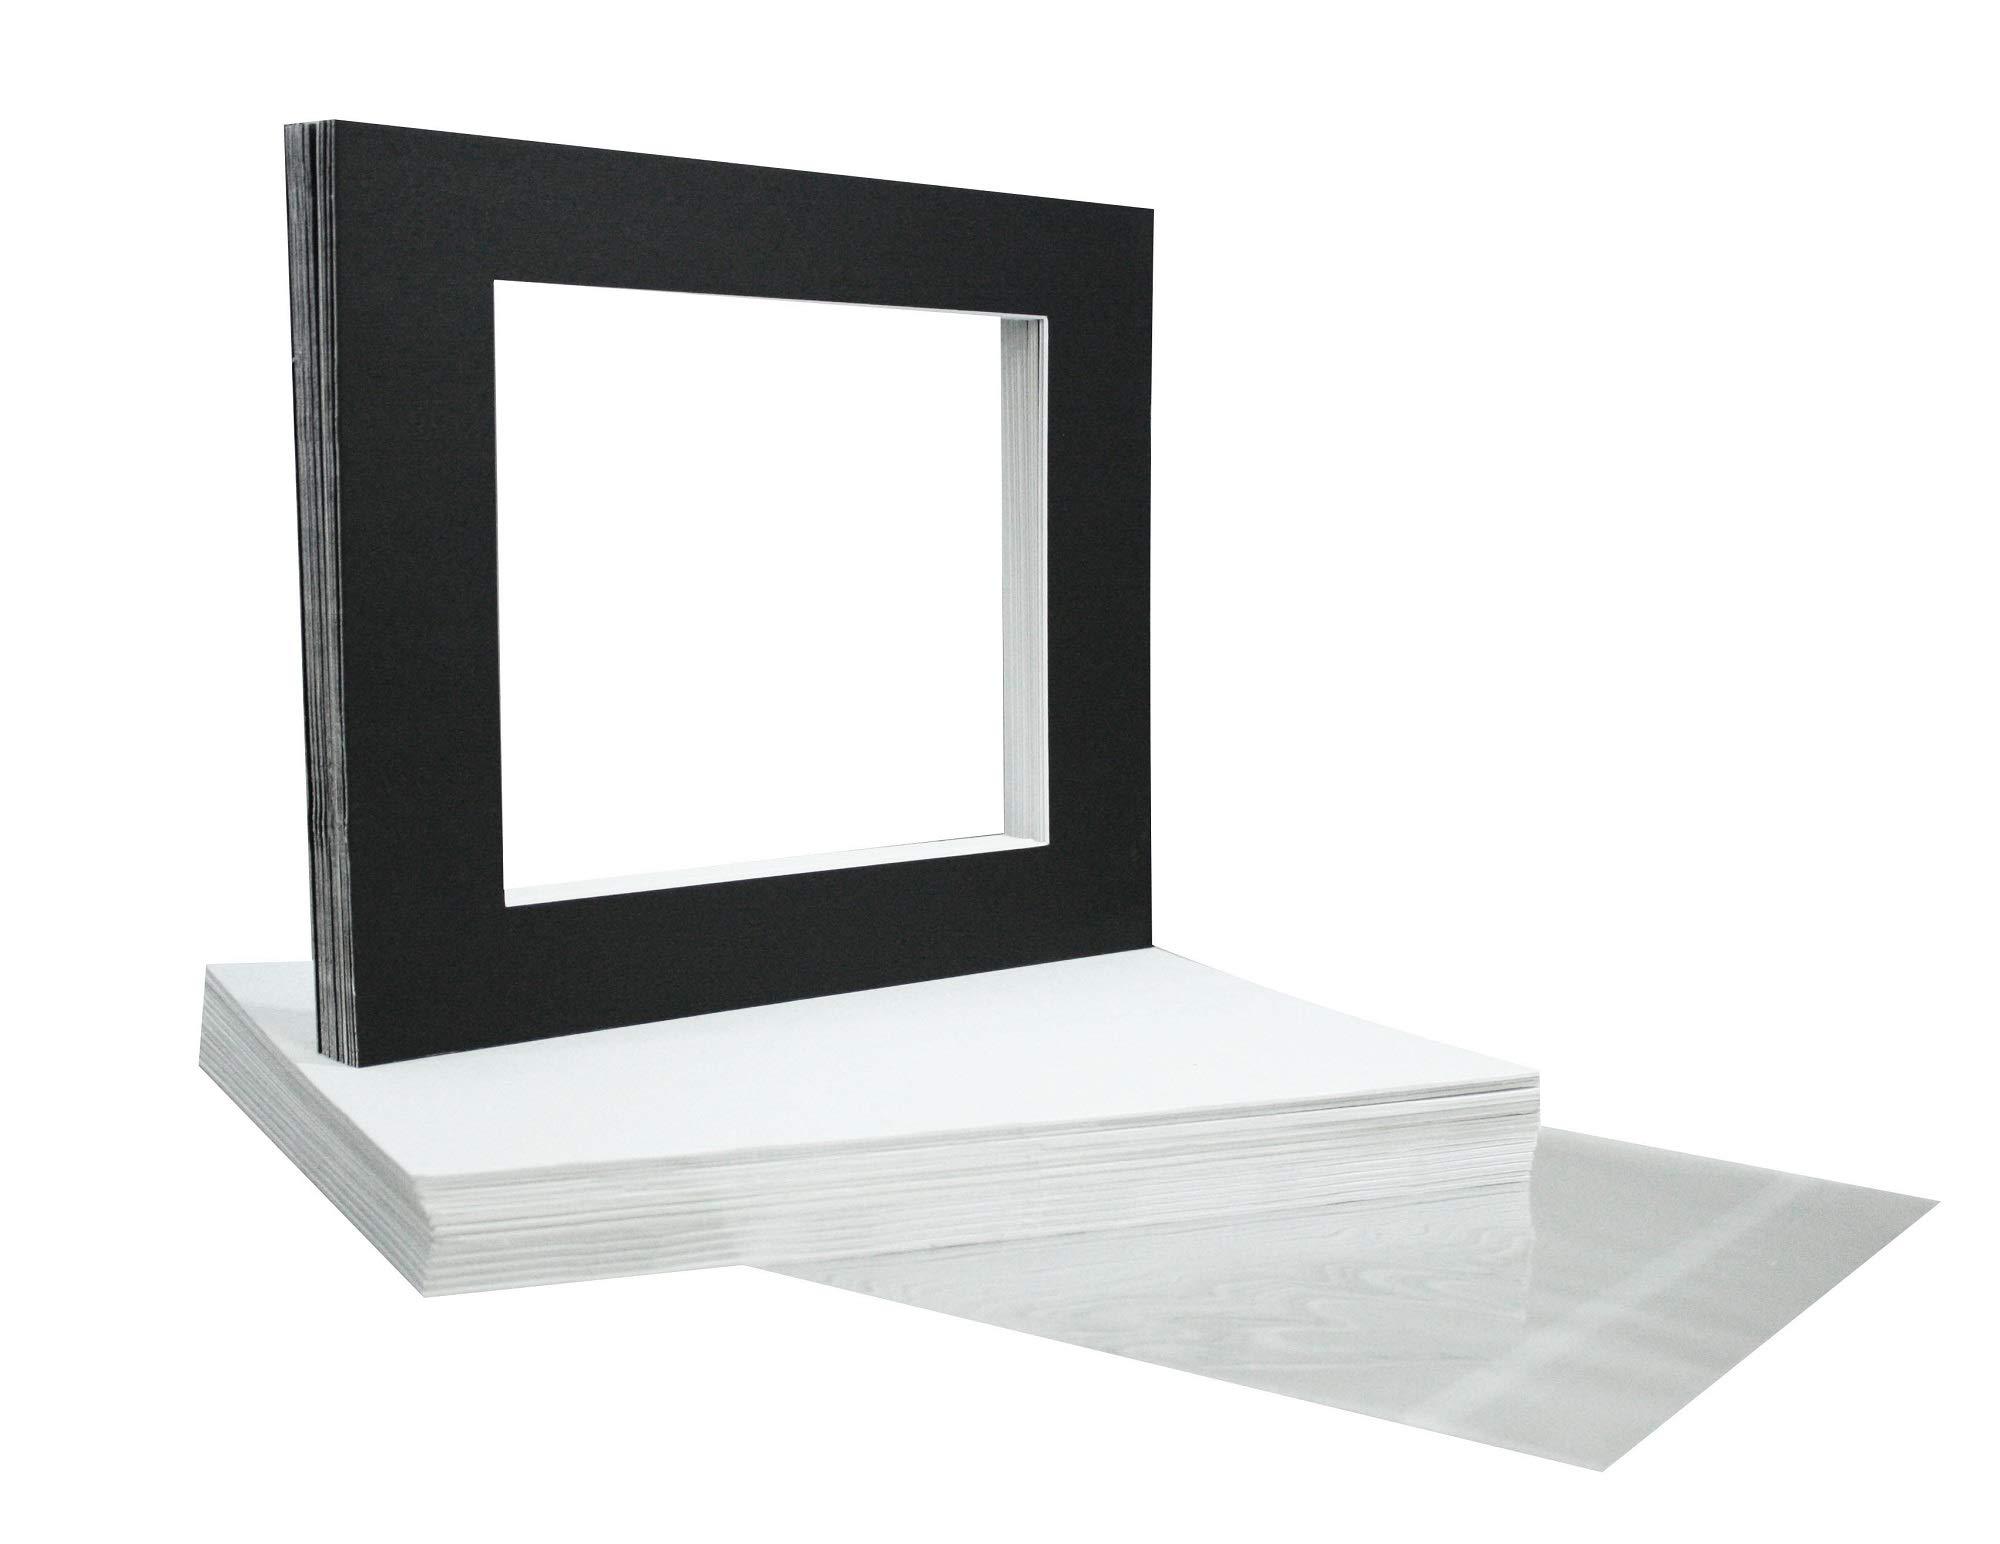 Golden State Art, 20 11x14 Black Mats Matting for 8.5x11 + Backing + Bags by Golden State Art